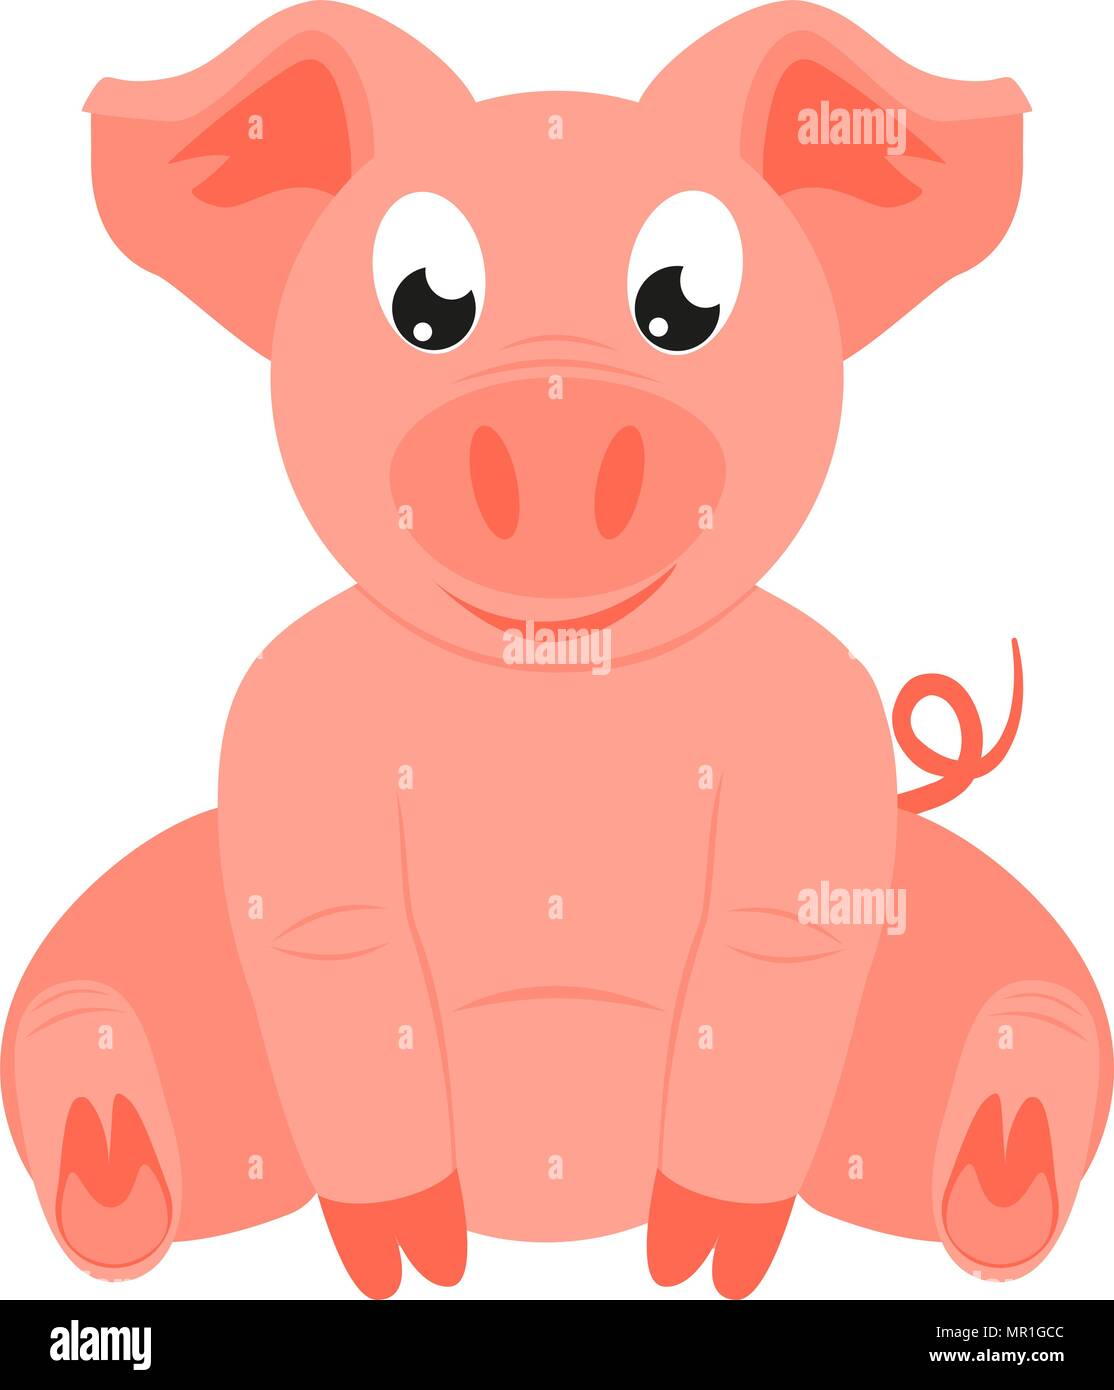 Colorful Cartoon Happy Sitting Pig 2019 Year Chinese Symbol Farm